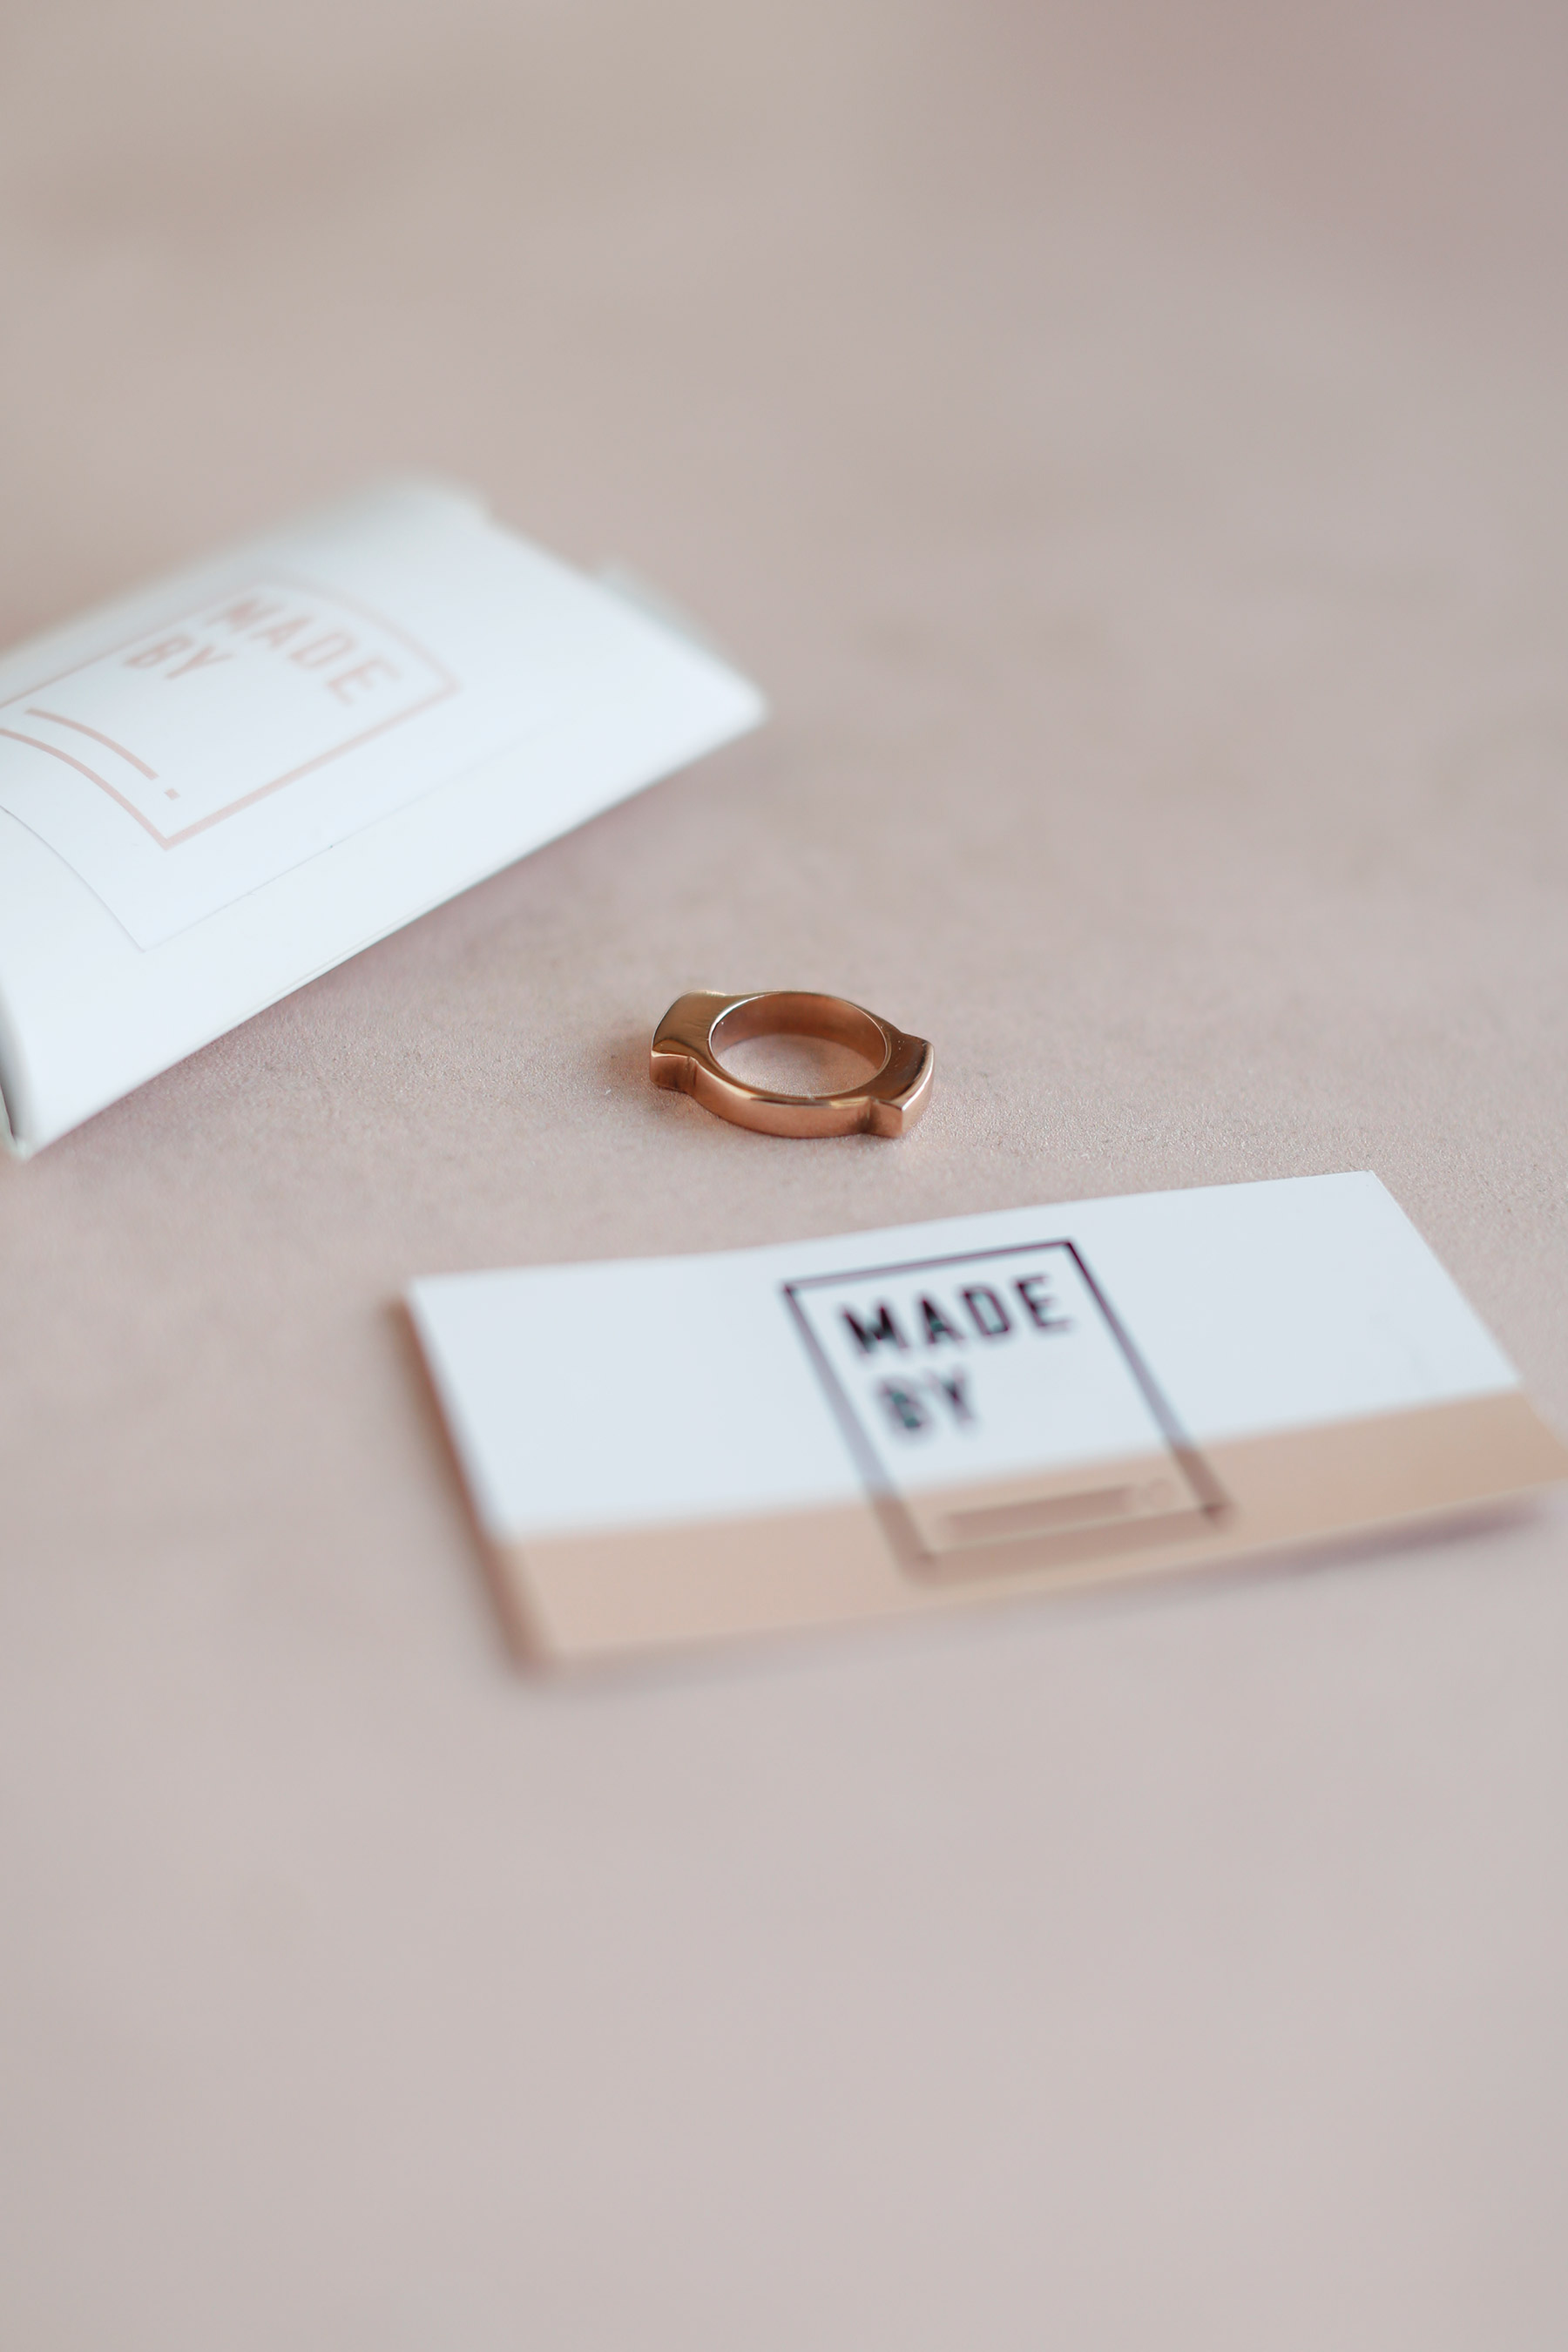 Made-By-Jewellery.jpg